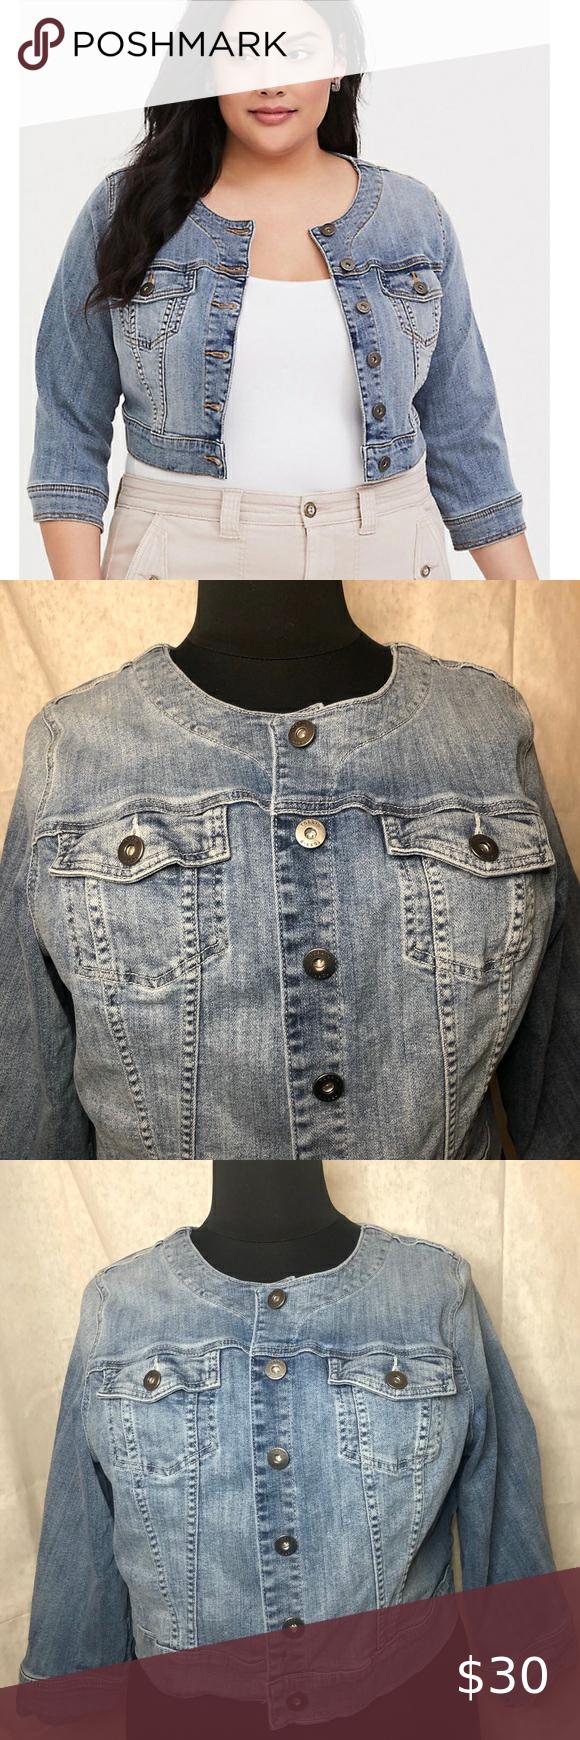 Torrid 3x Cropped 3 4 Sleeve Jean Jacket No Collar Denim Jacket Women Fitted Denim Jacket Denim Sweater Jacket [ 1740 x 580 Pixel ]